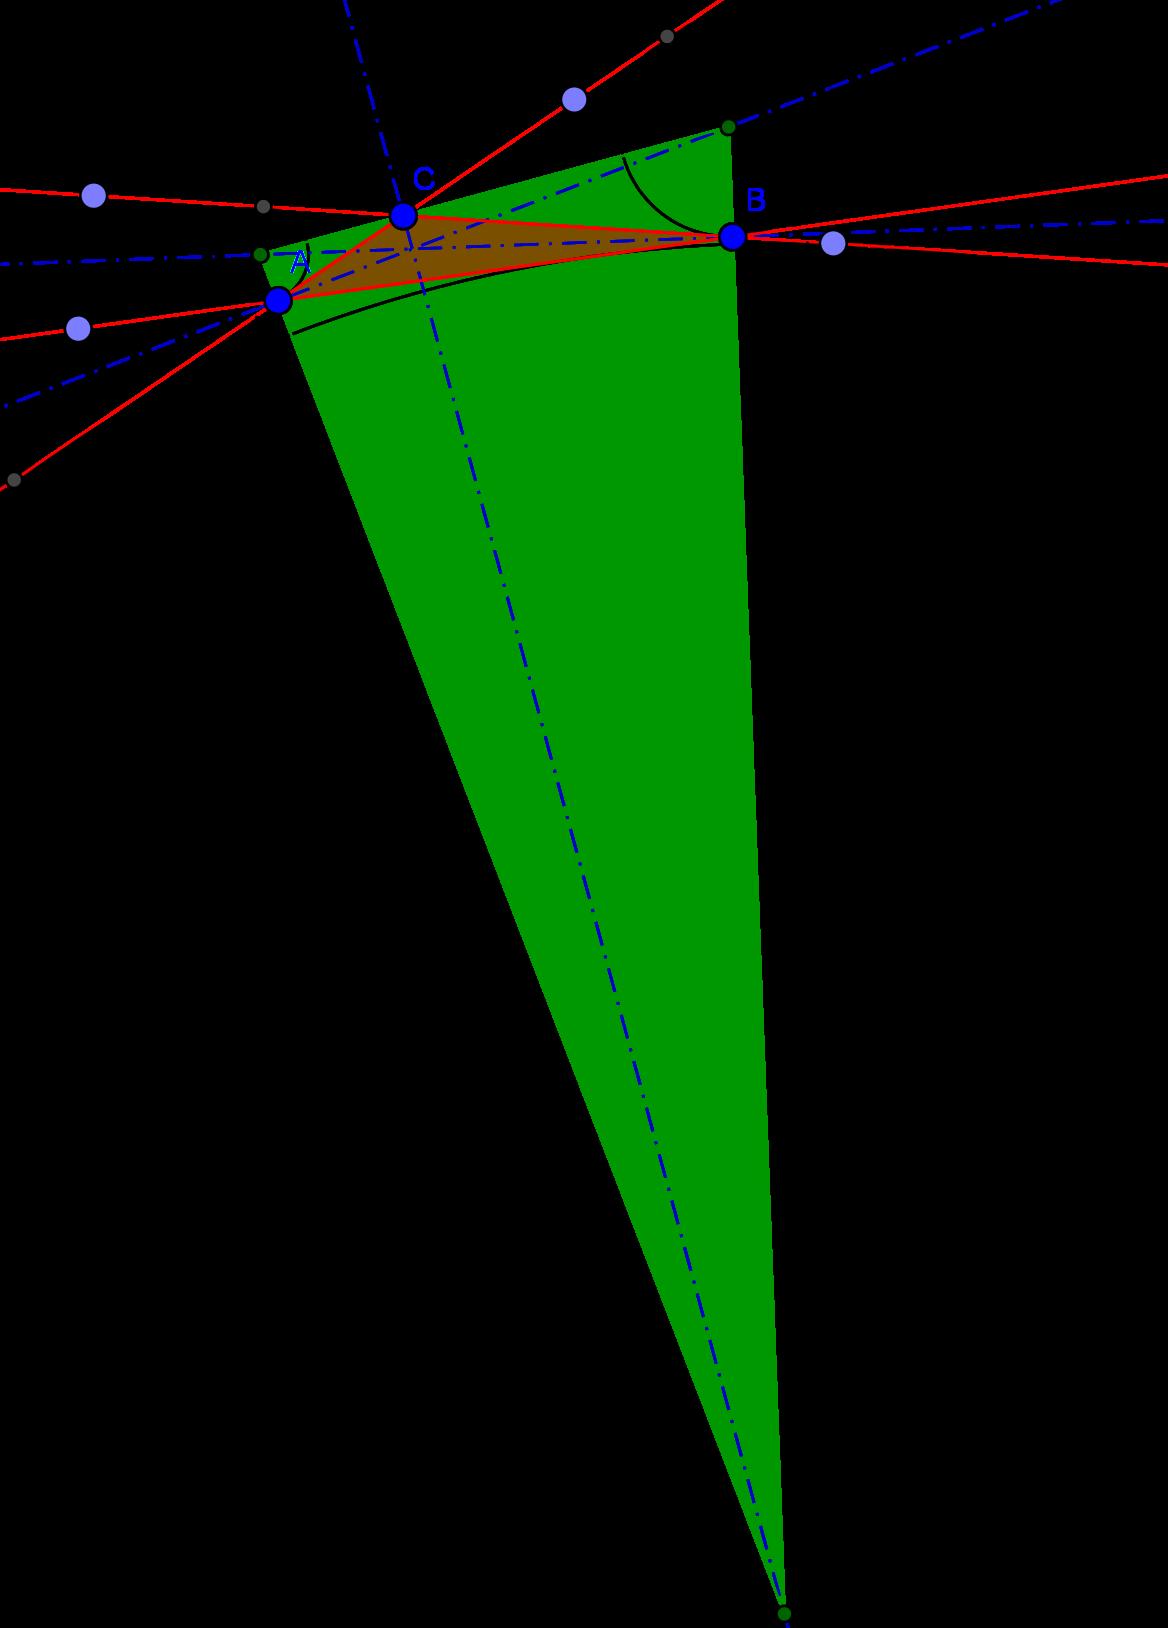 http://forum.matematika.cz/upload3/img/2017-04/45233_kru%25C5%25BEnice%2Bp%25C5%2599ipsan%25C3%25A1%2B%25282%2529.png